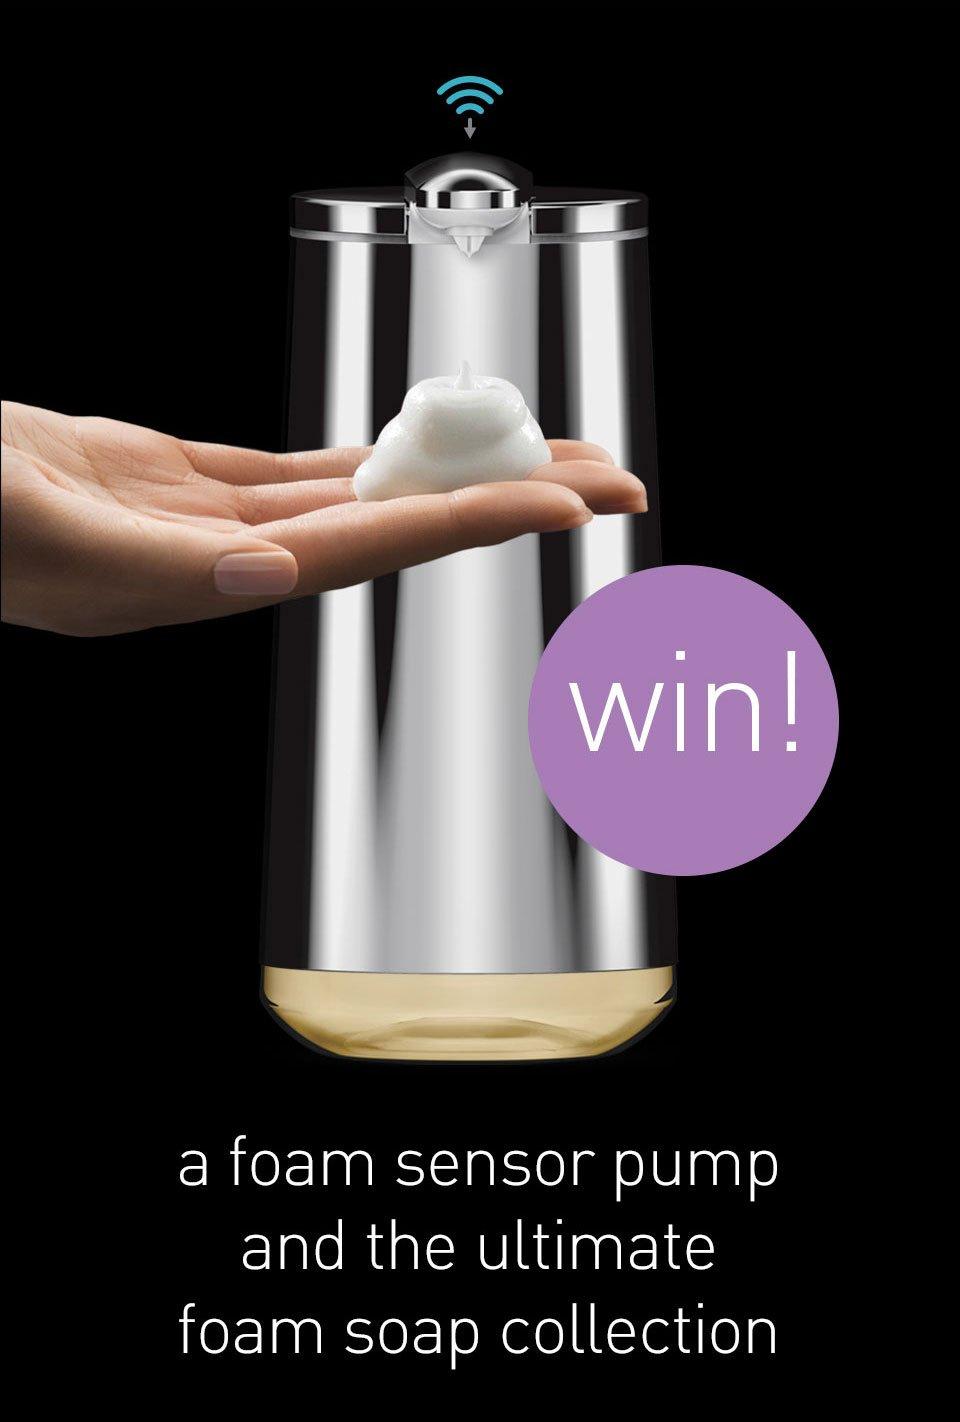 win a foam cartridge sensor pump and the ultimate foam soap collection